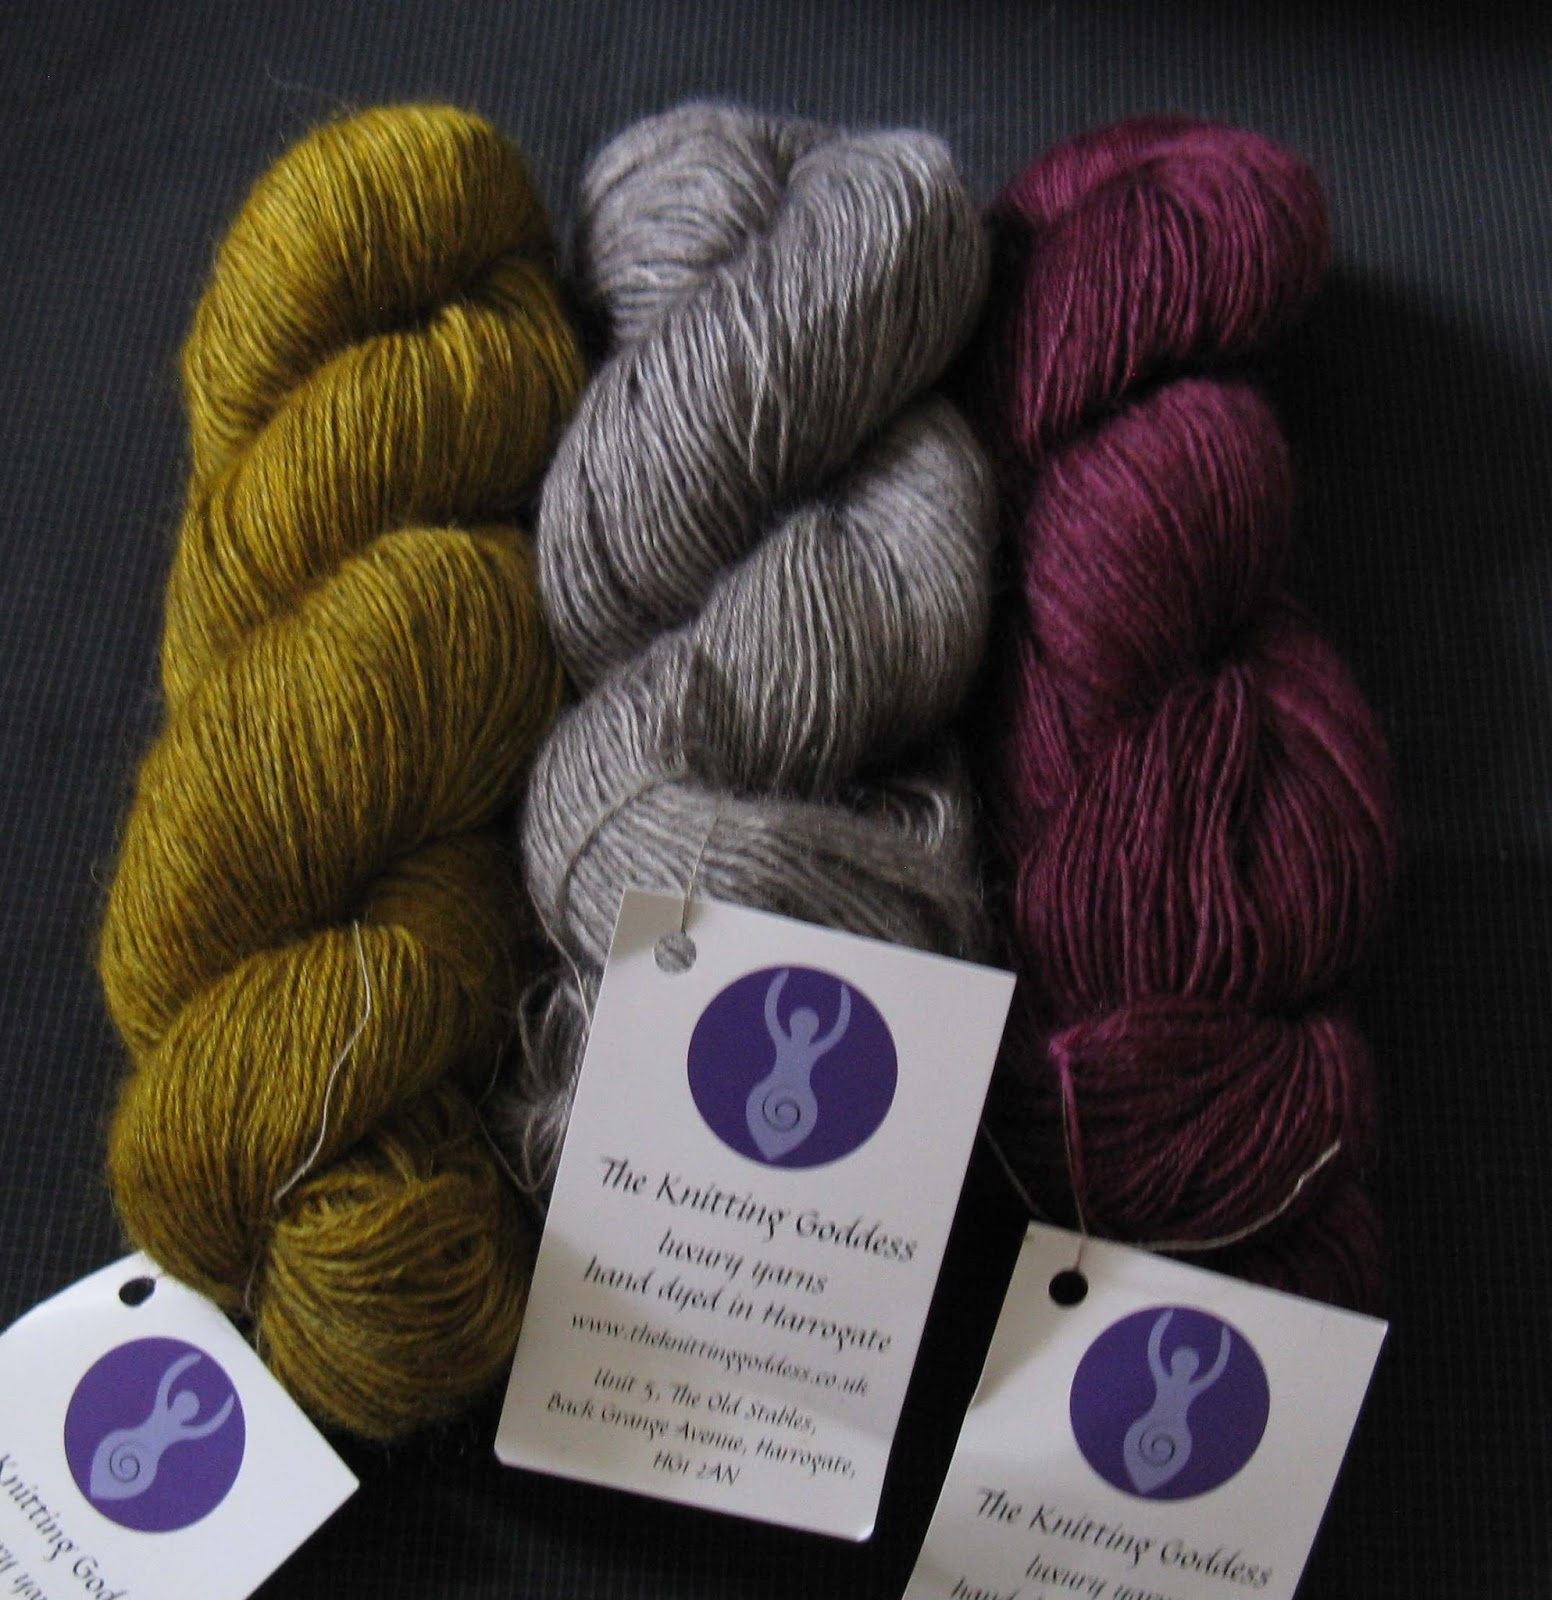 Knitting Goddess : Julia hedge s laces edinburgh yarn festival recap part